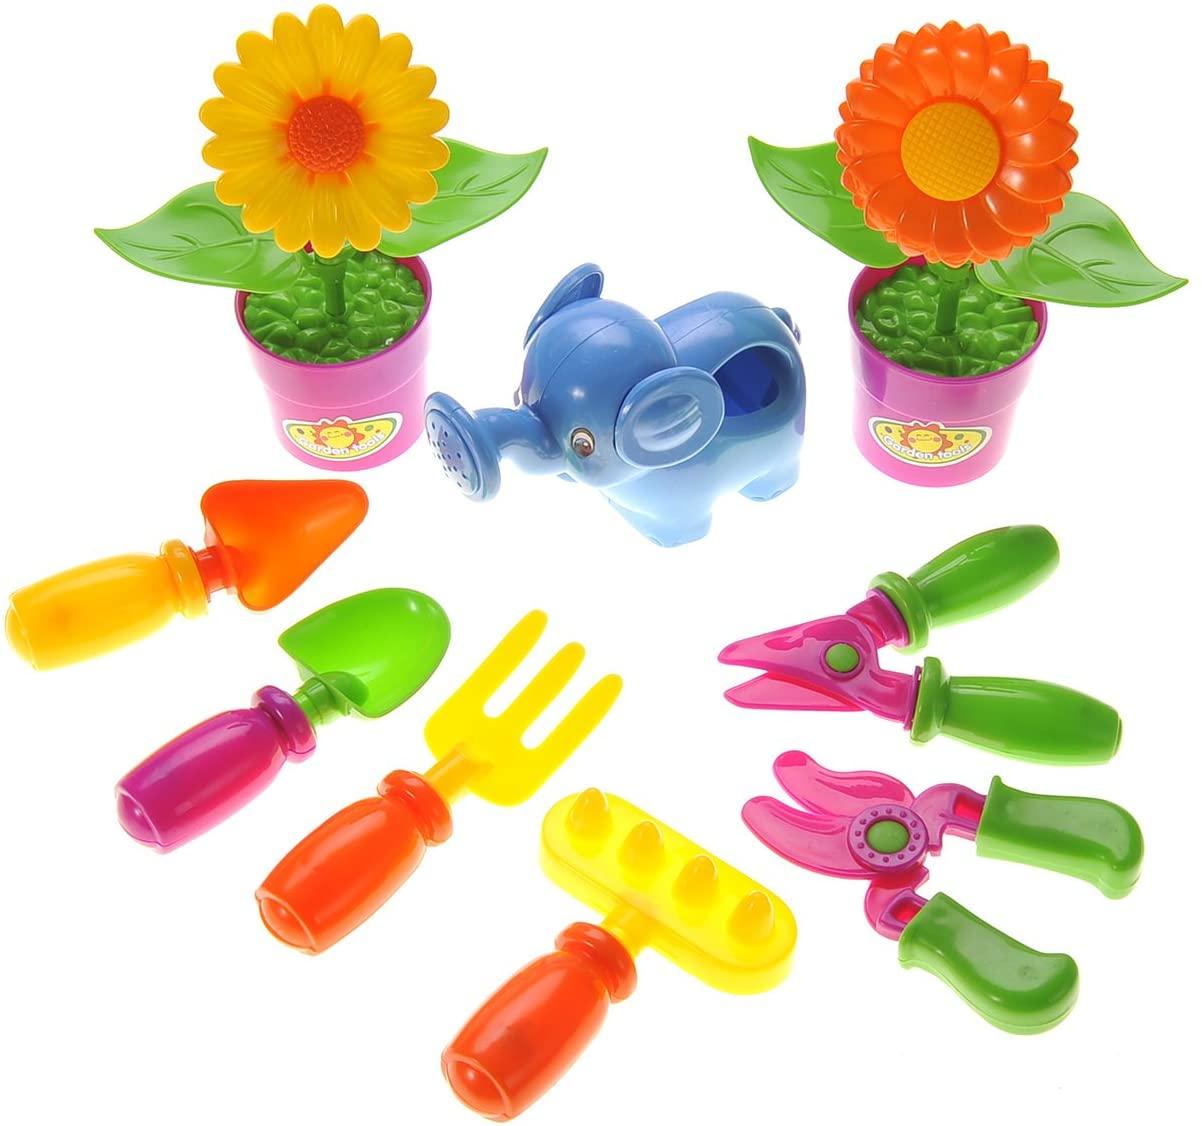 PowerTRC Little Garden Tool Playset   Kids Pretend Play Gardening   9 Garden Tools and Plants Pieces